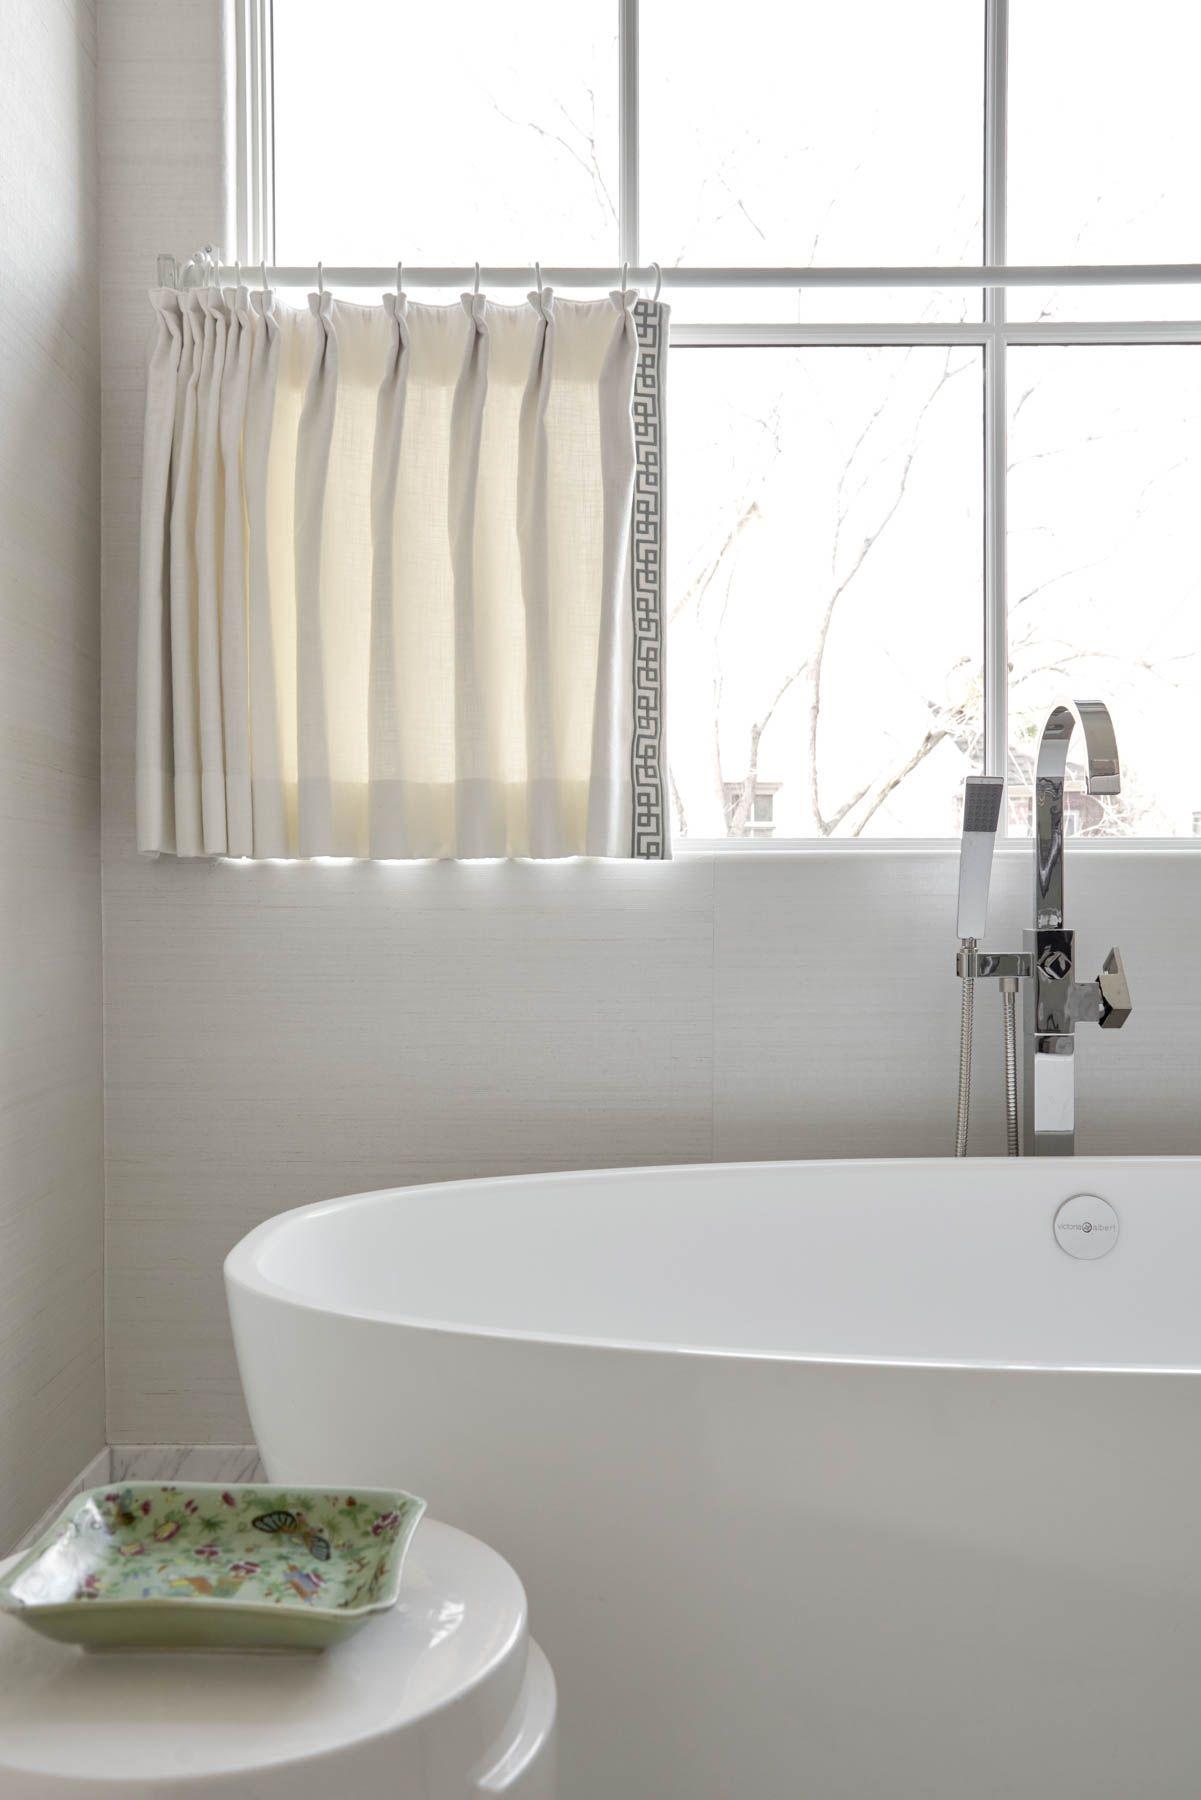 Bath under window ideas  bath u powder rooms u jenkins interiors  bathroom  pinterest